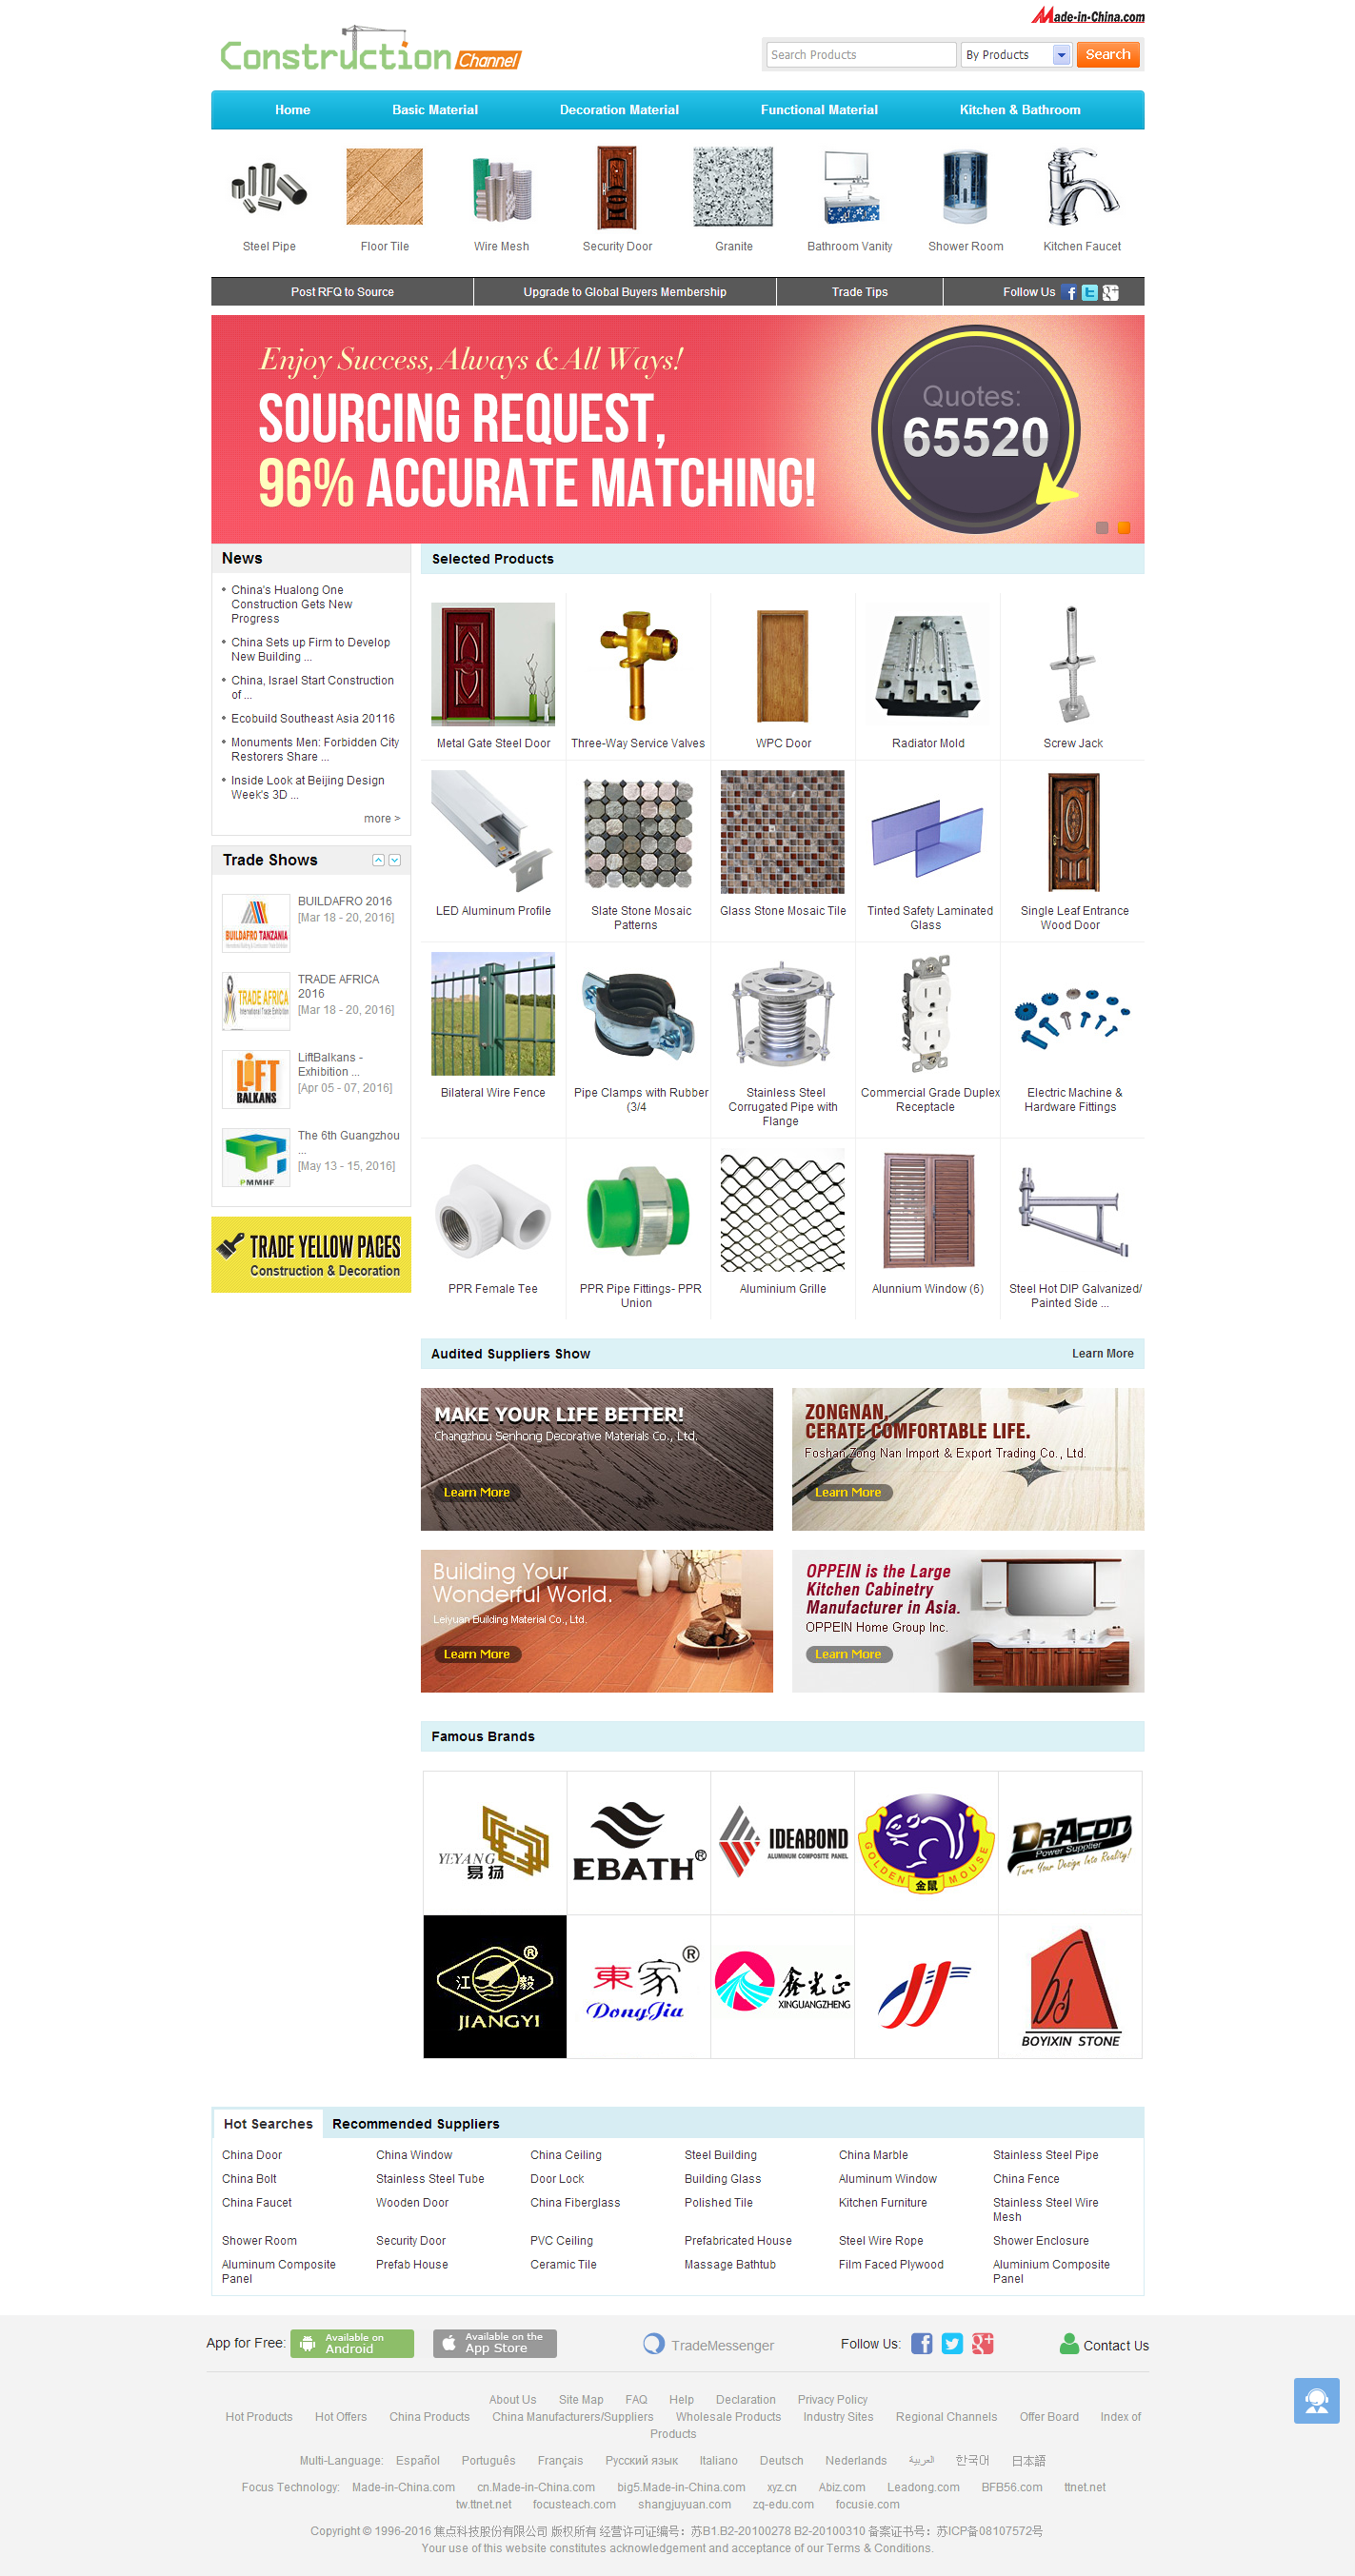 Basic Material, Security Door - Construction & Dec